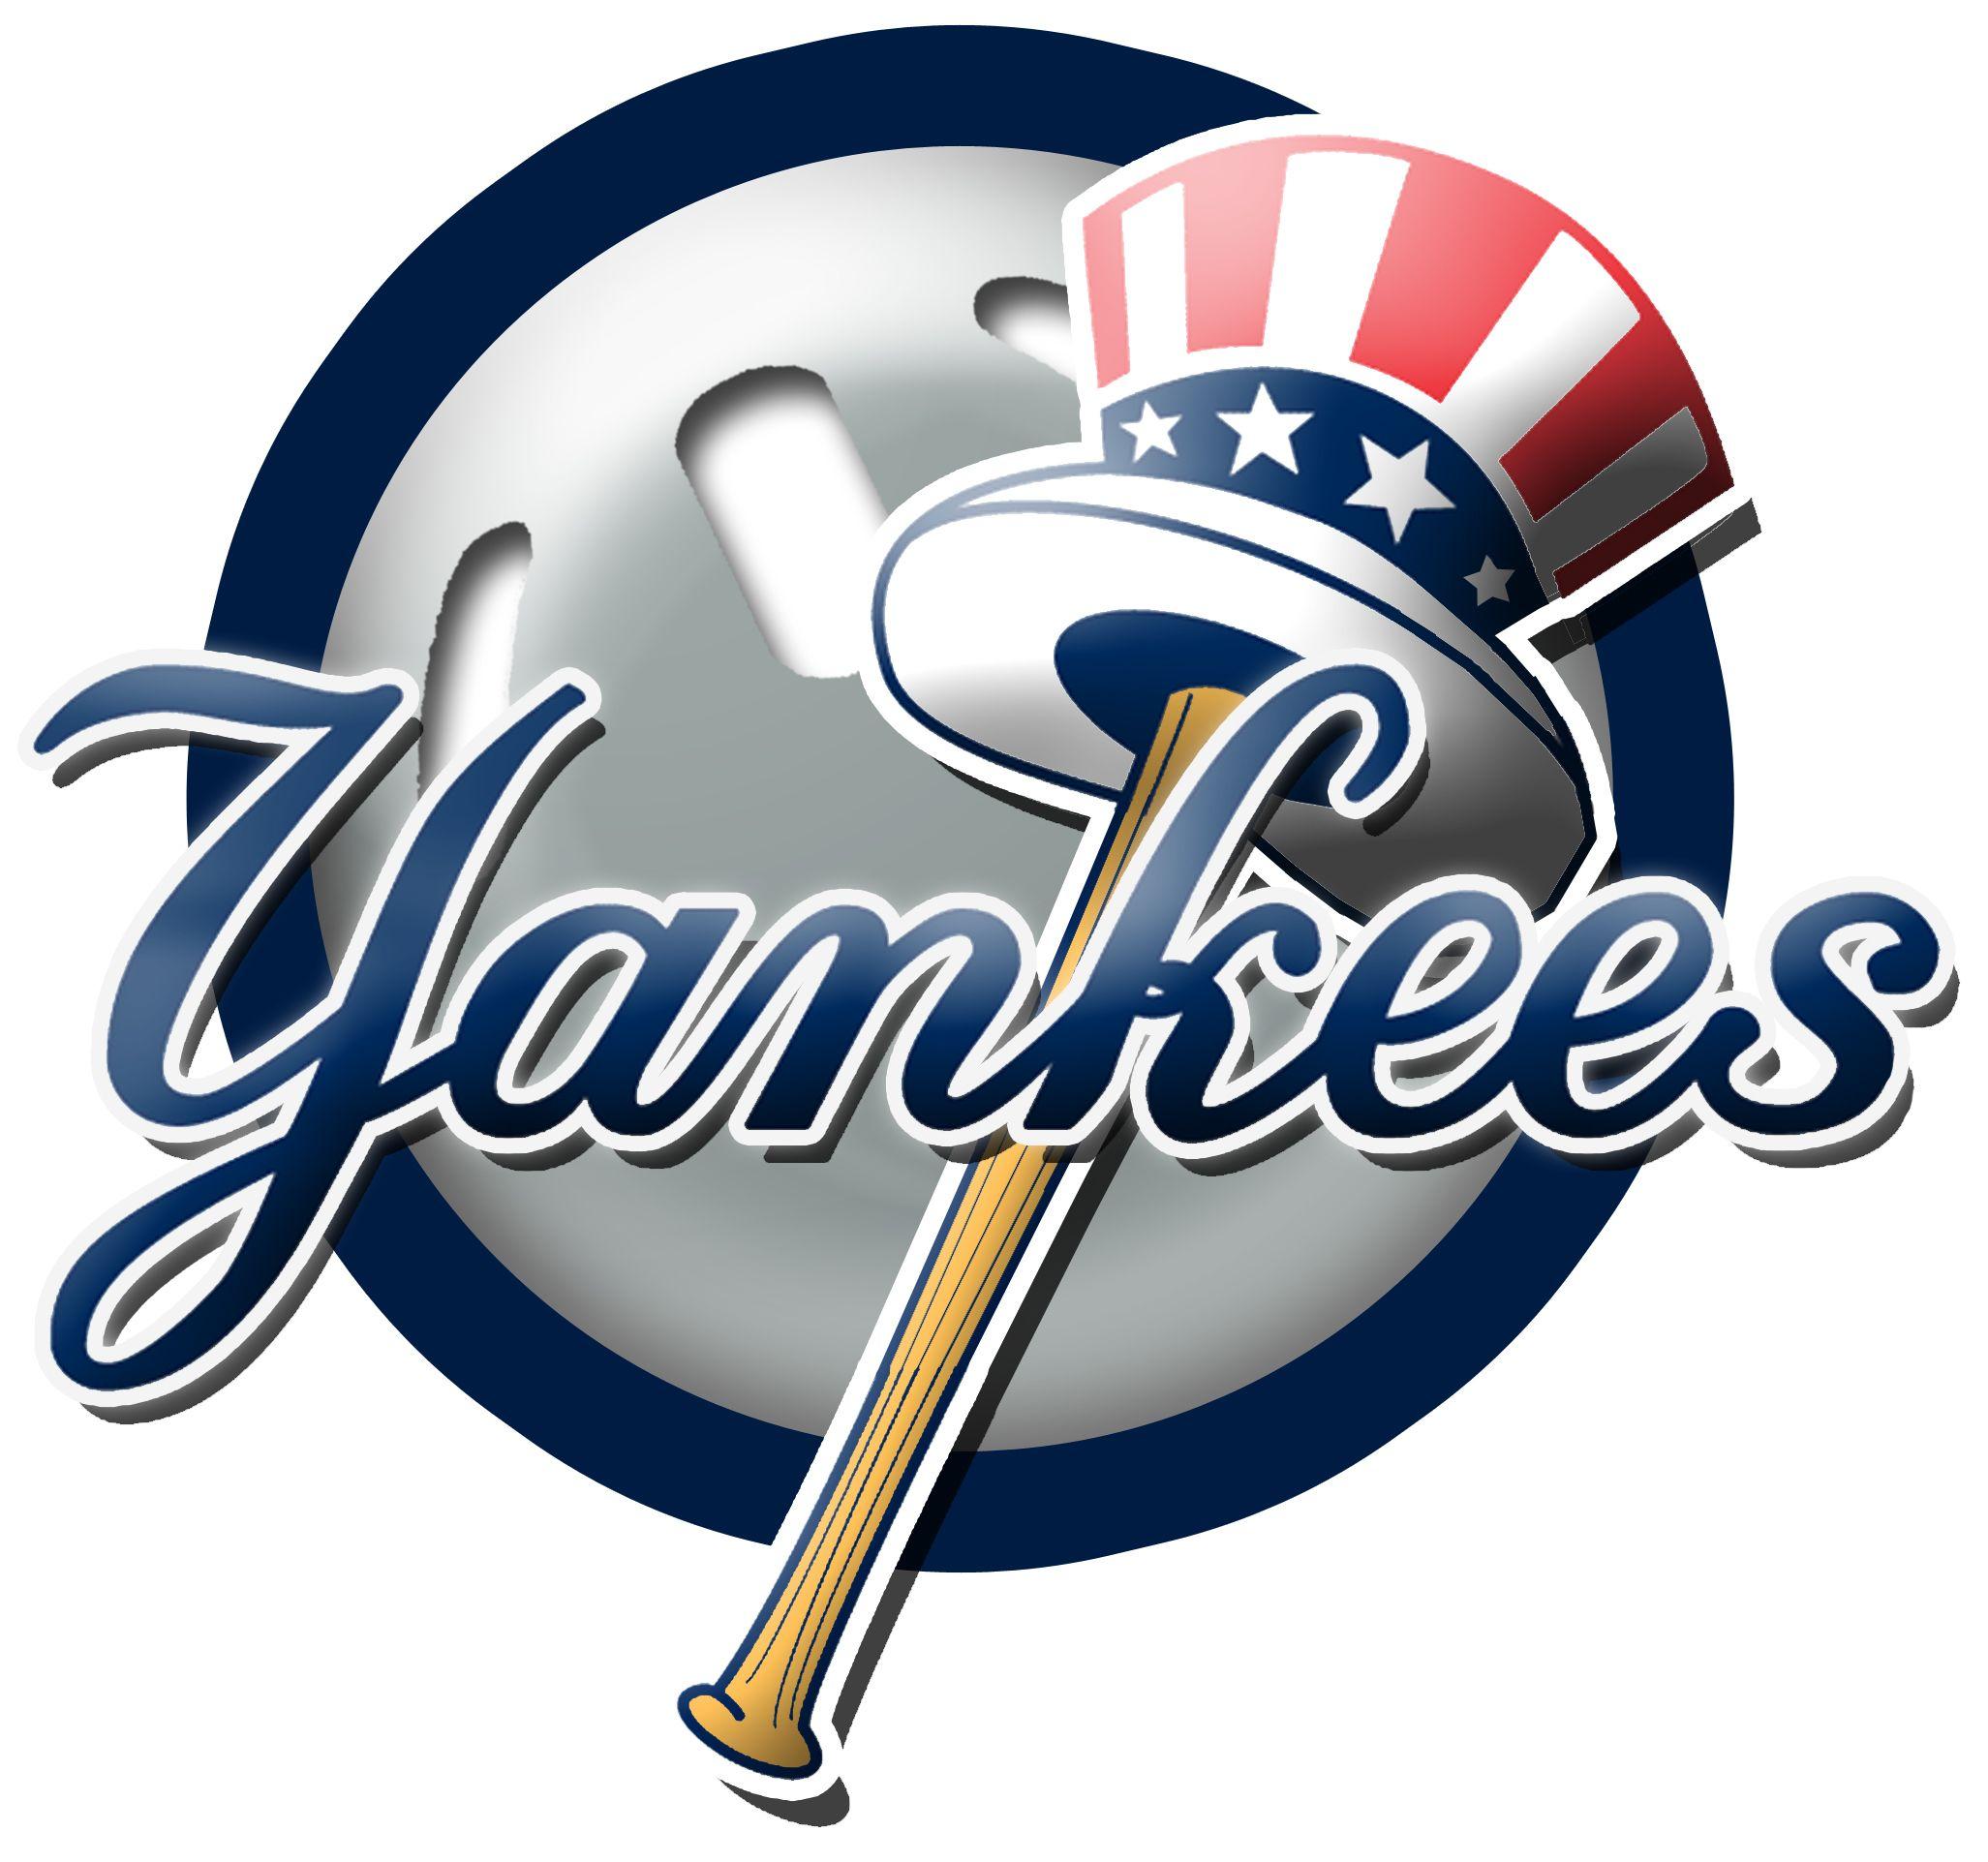 New York Yankees Ny Yankees Ny Yankees Logo Yankees Logo